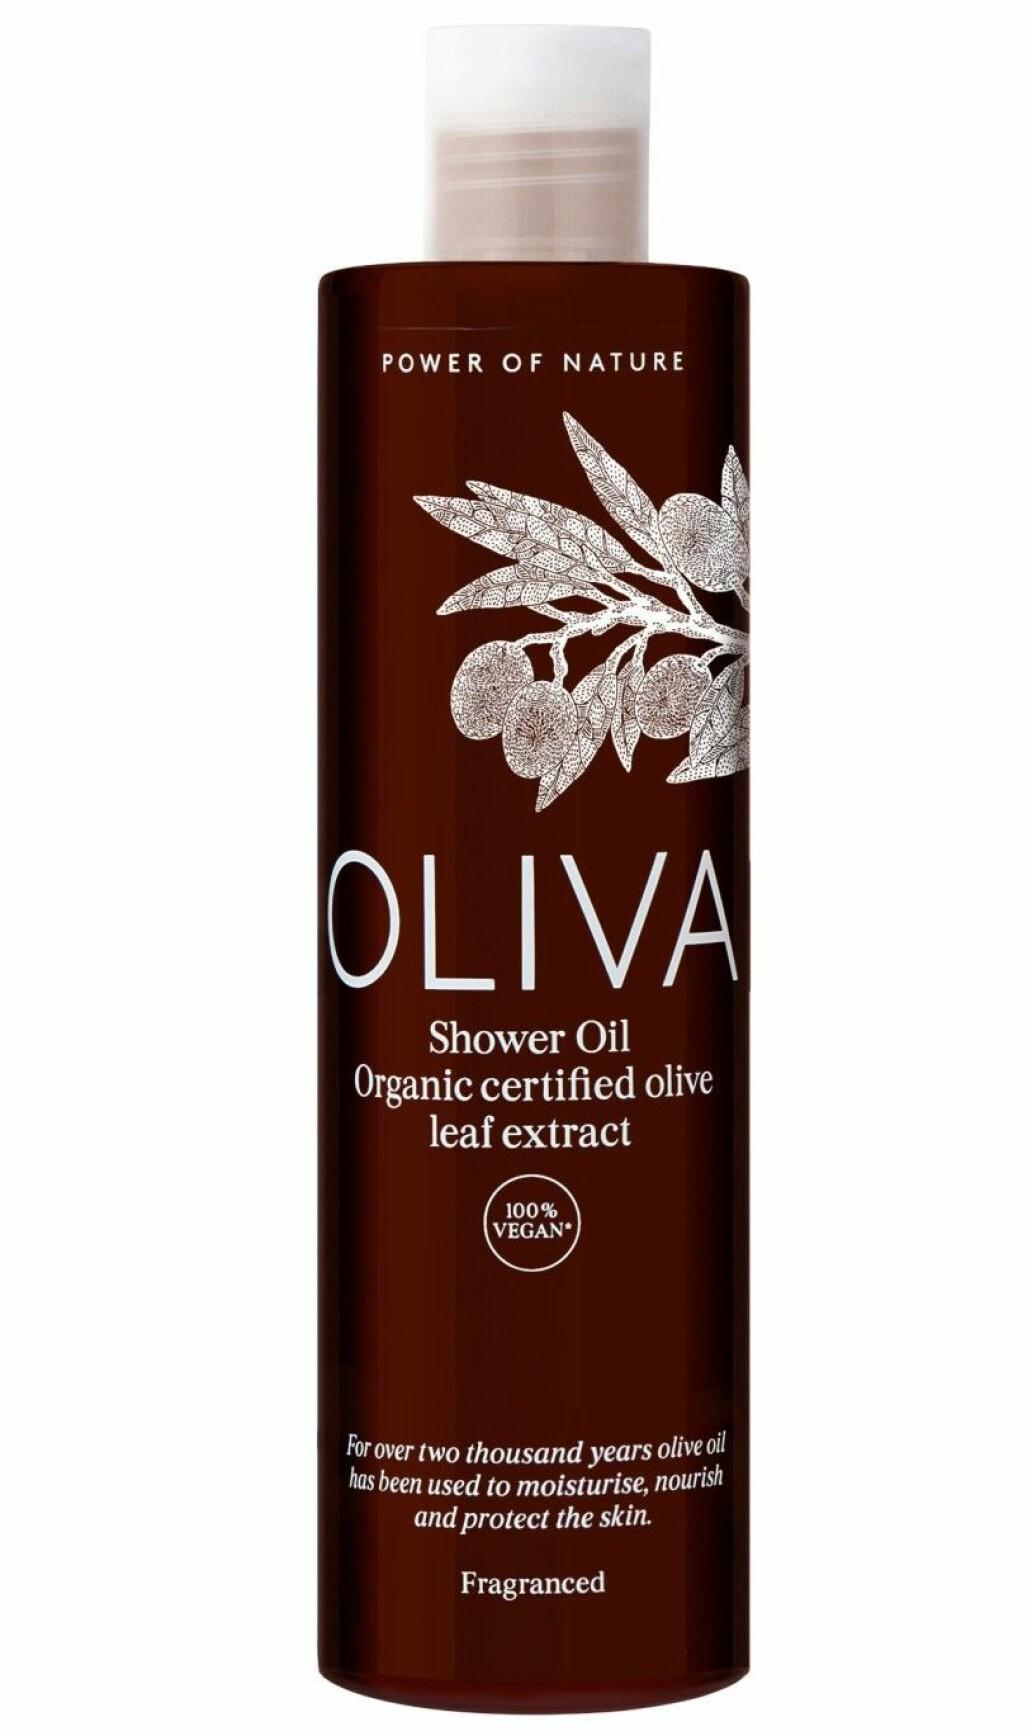 Oliva duscholja